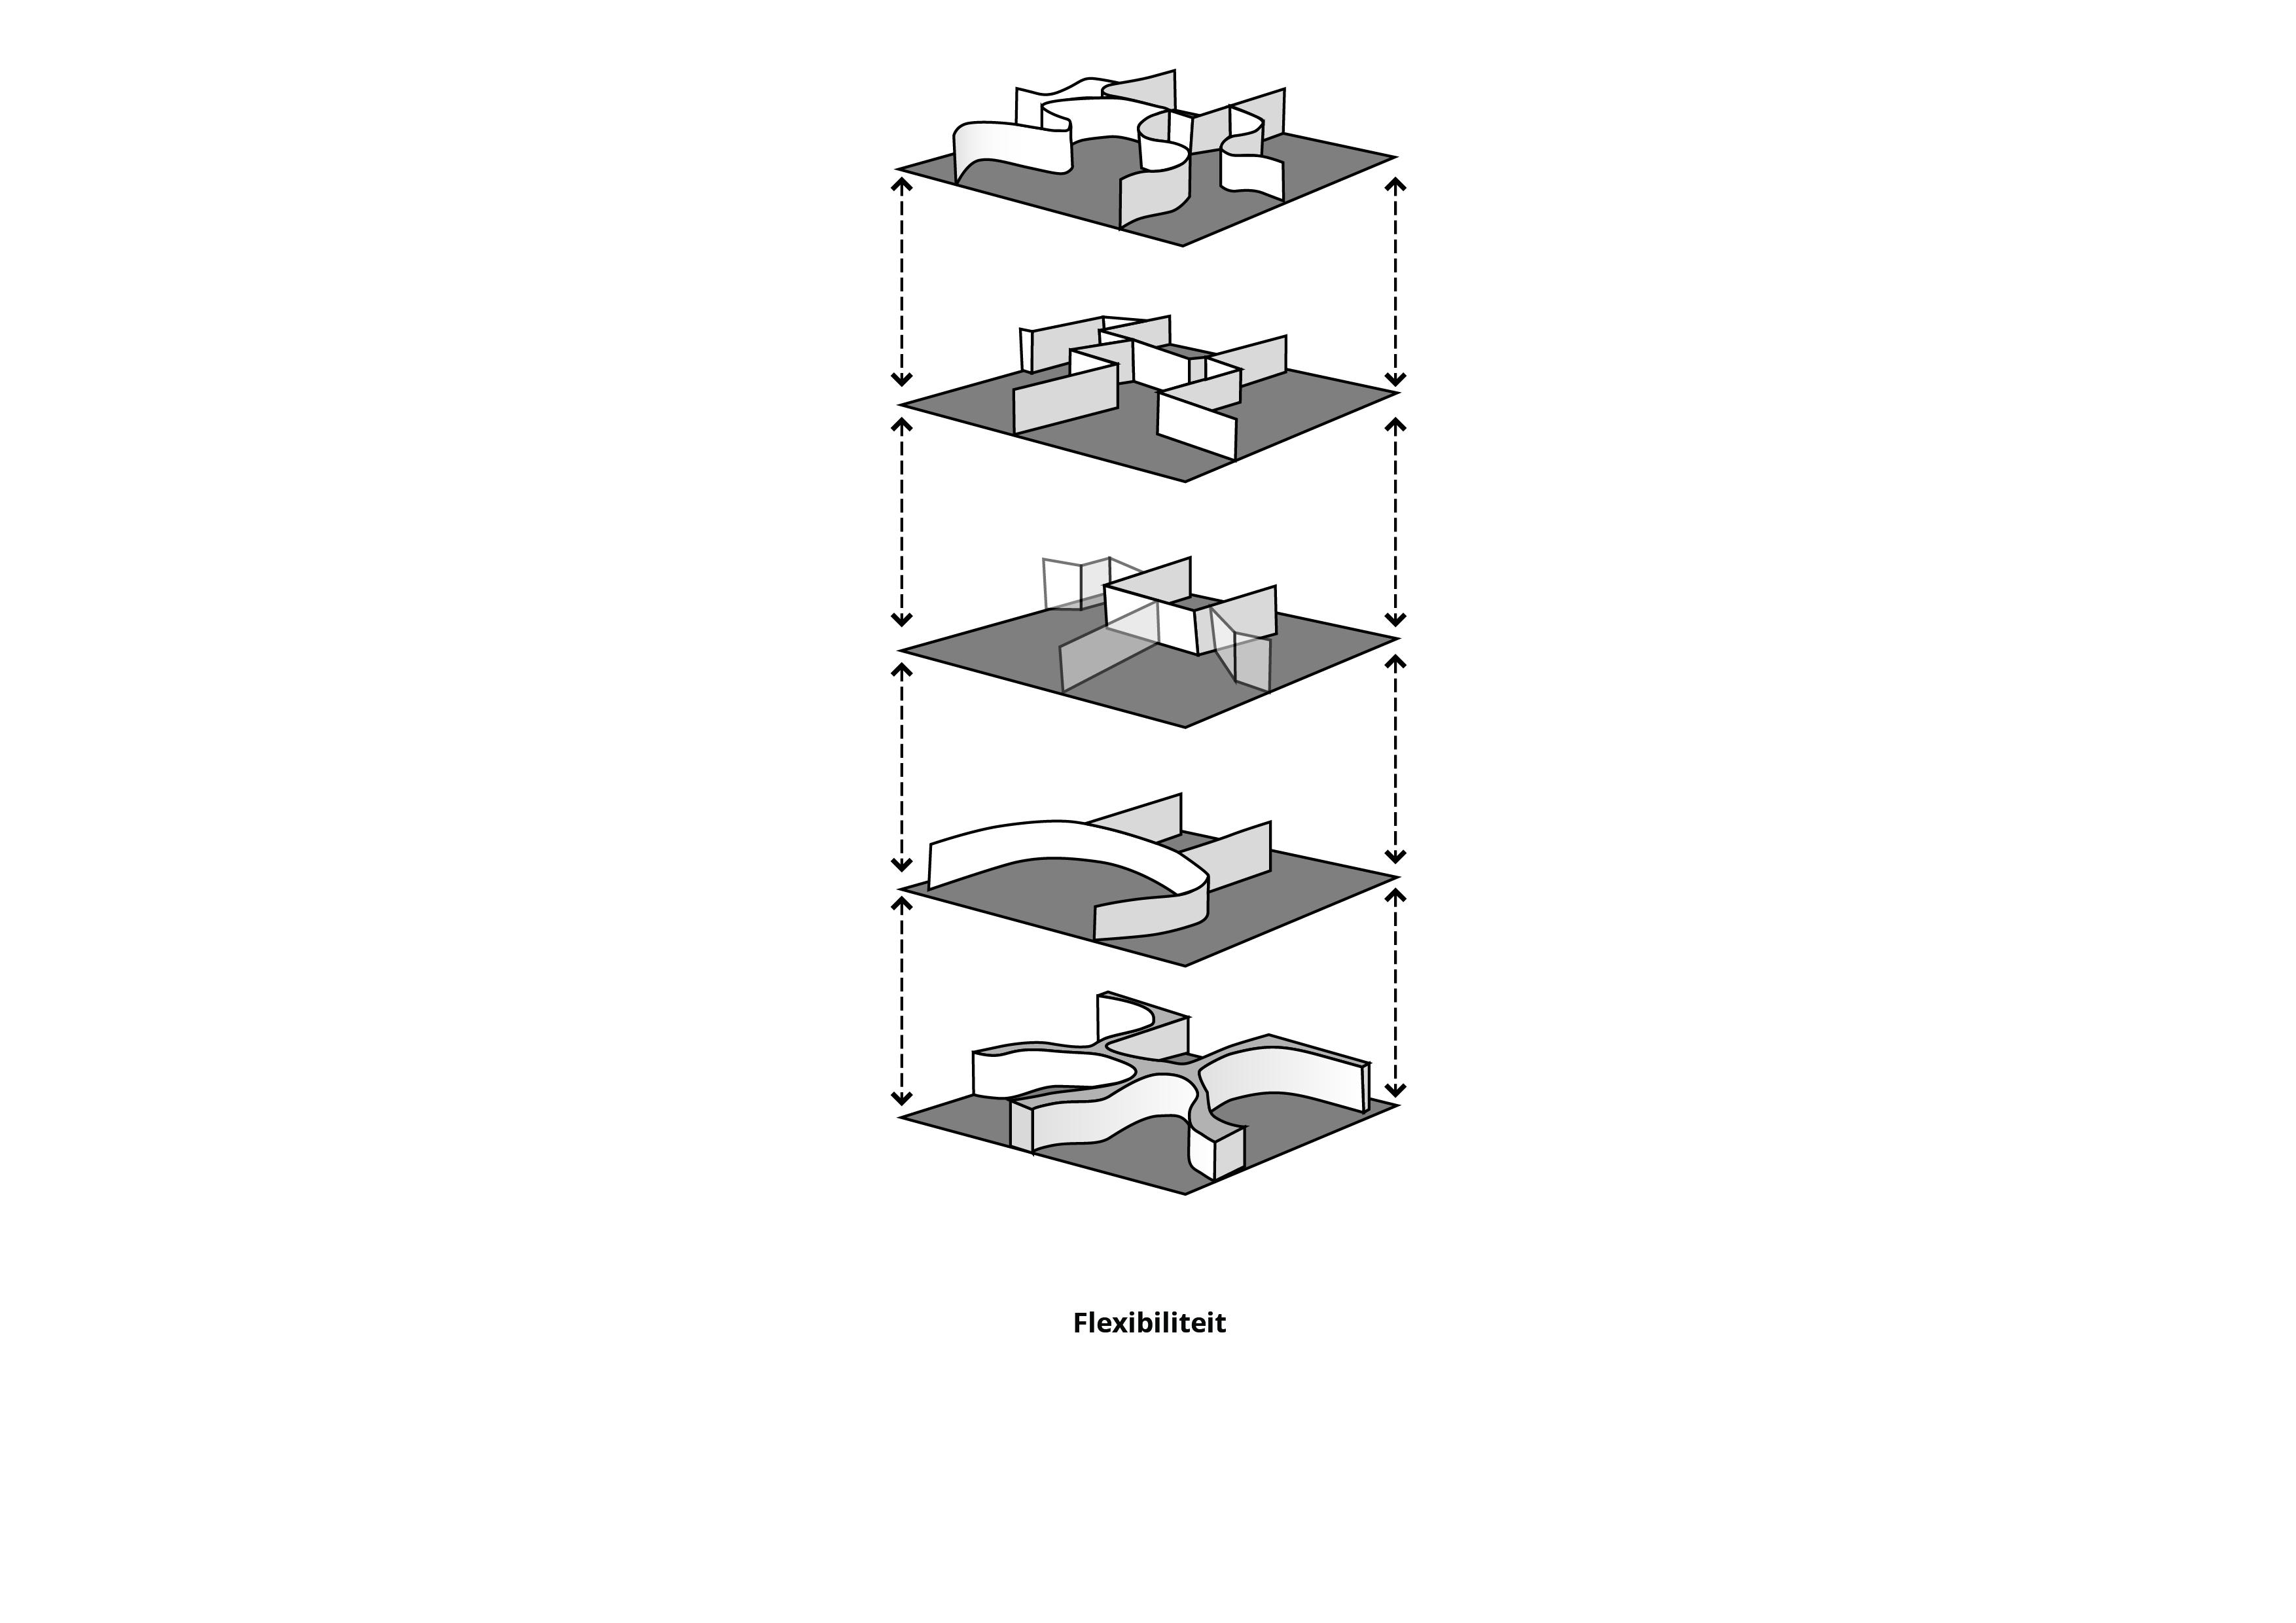 Havenkwartier Lelystad – Flexibiliteit